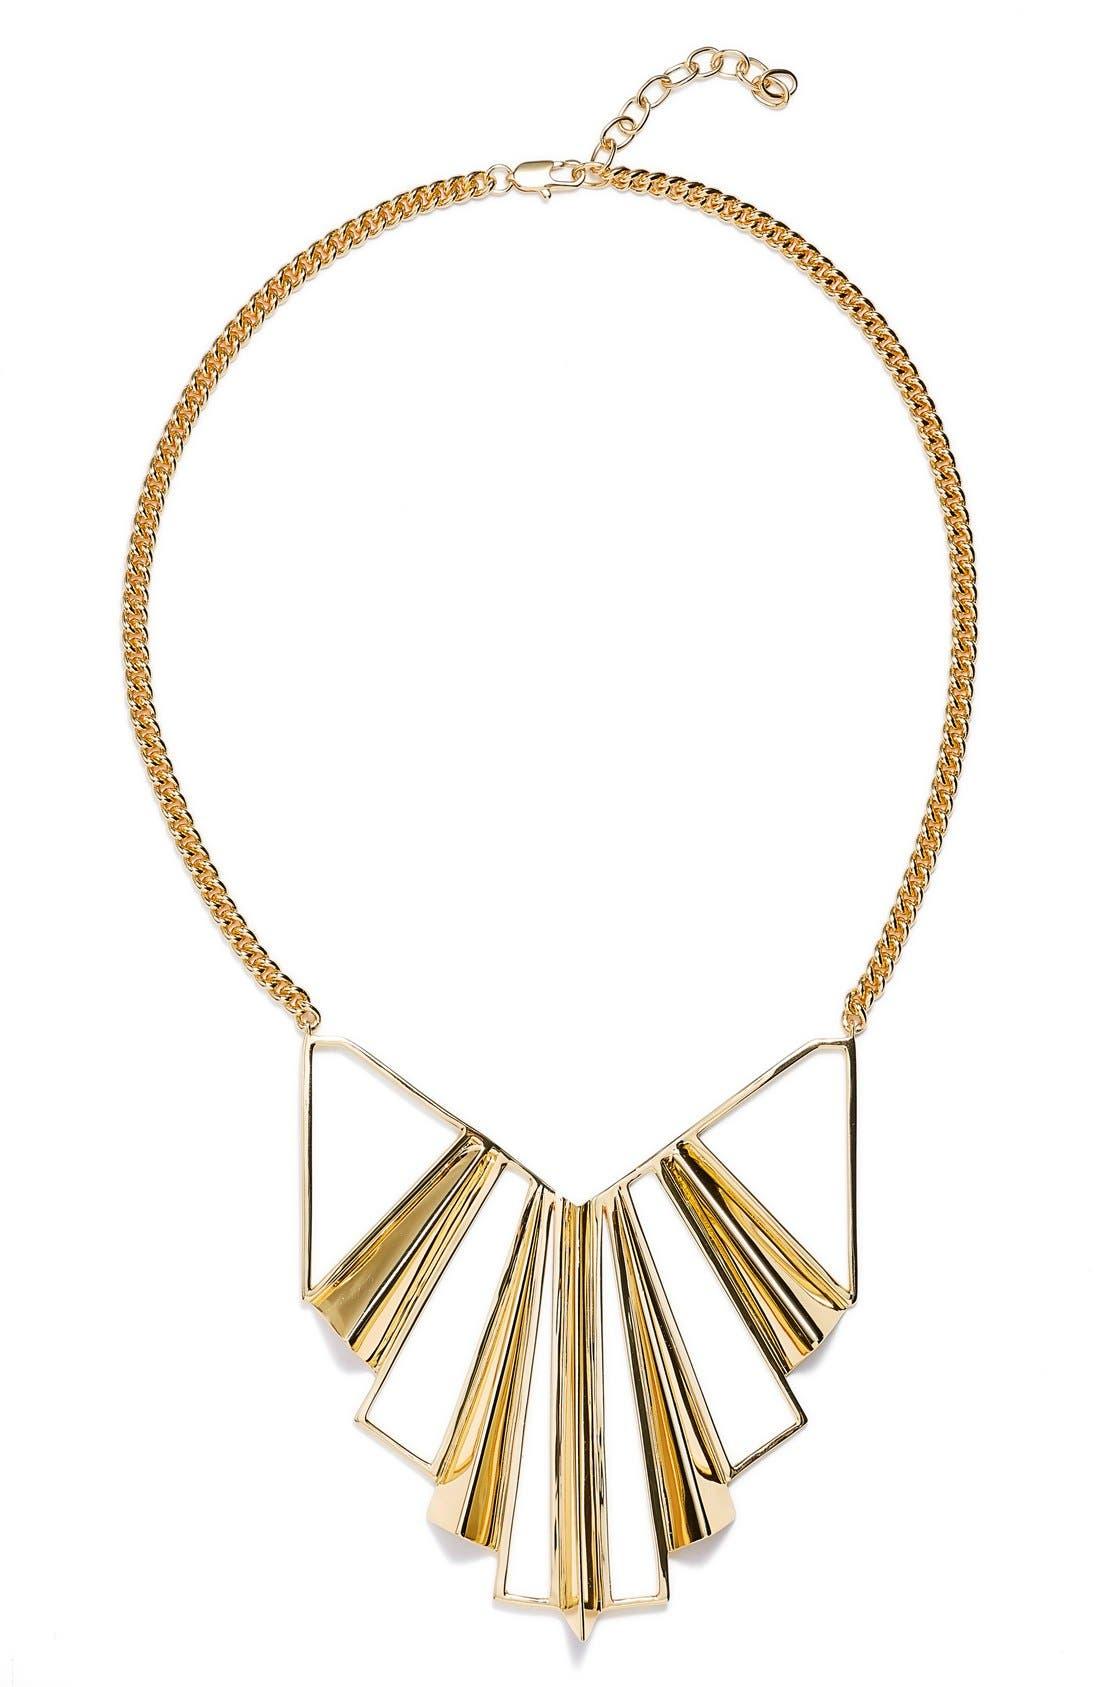 Alternate Image 1 Selected - Jules Smith 'Ursula' Bib Necklace